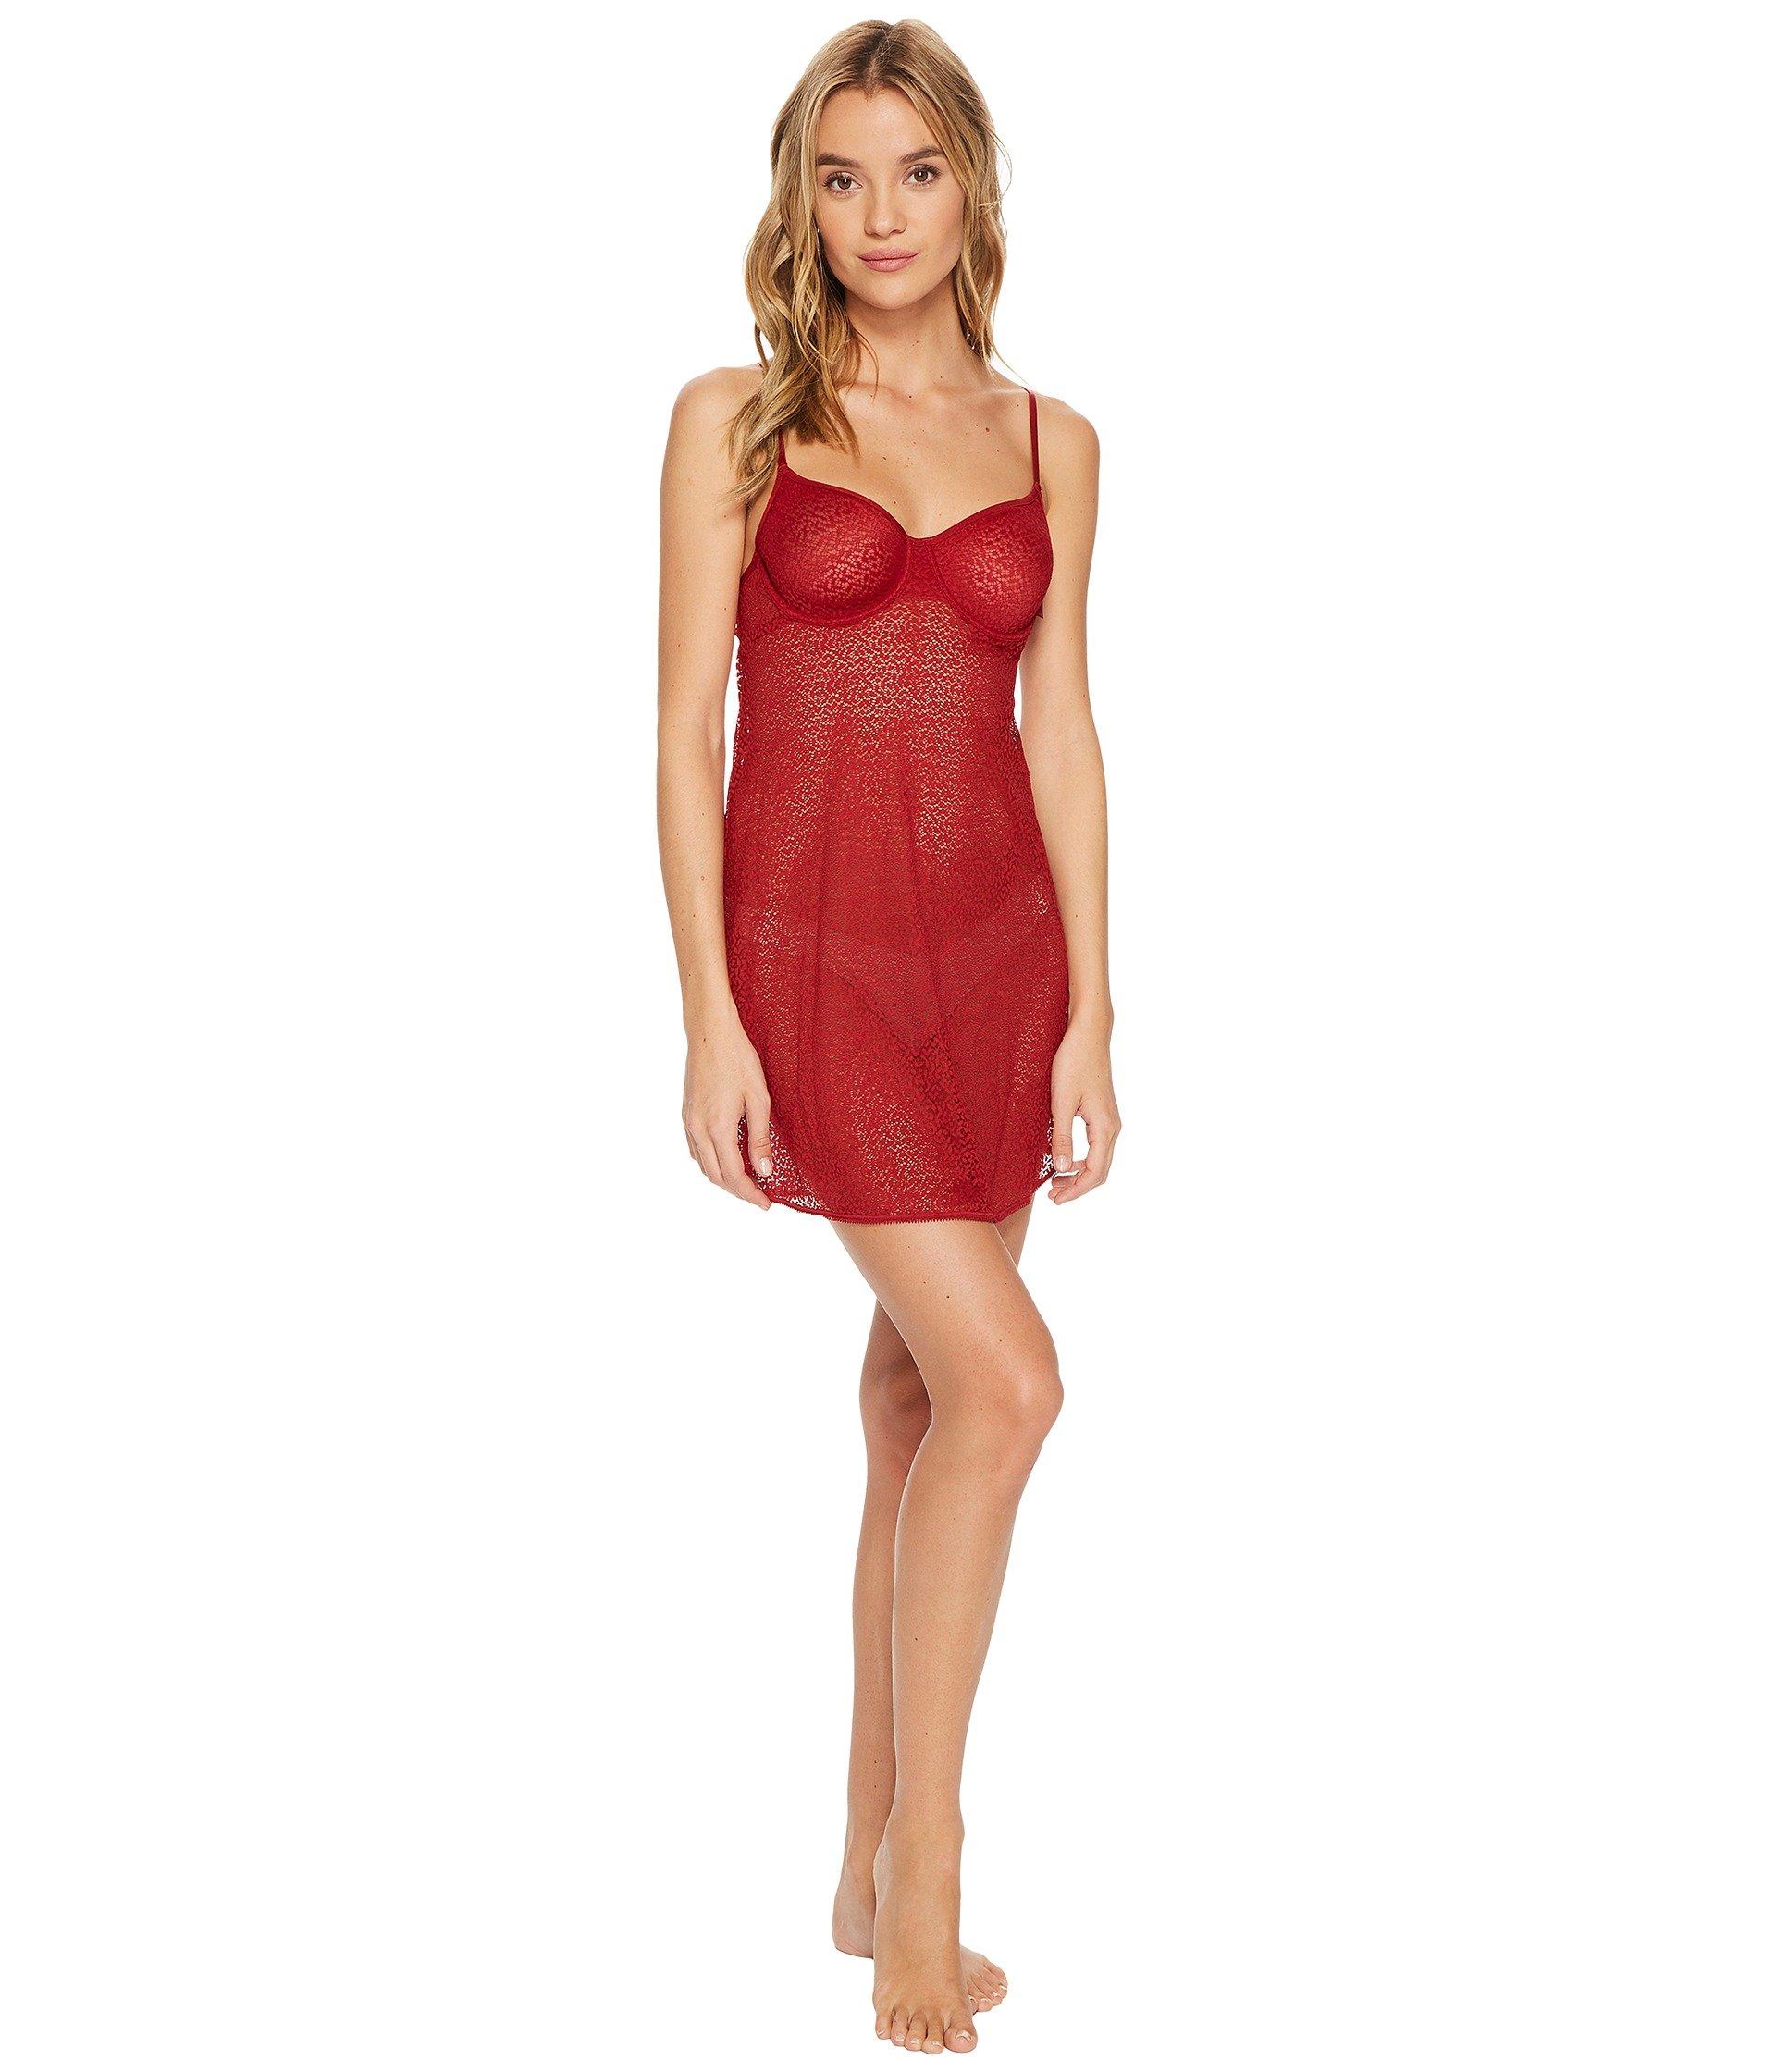 Lenceria DKNY Intimates Modern Lace Unlined Demi Chemise  + DKNY en VeoyCompro.net